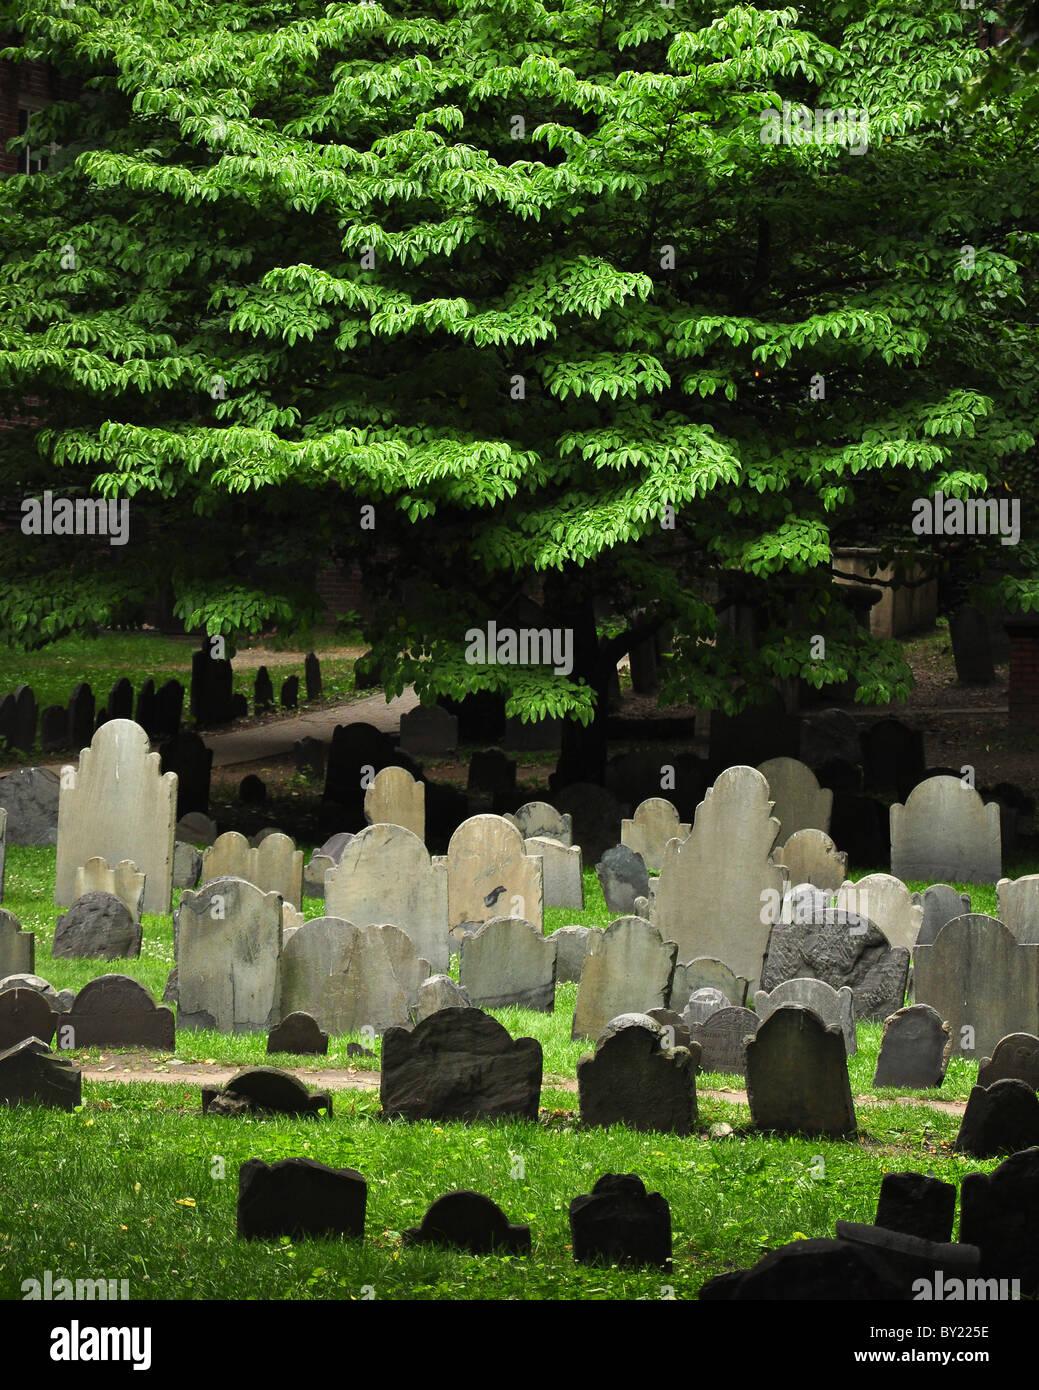 Granary Burying Ground, Boston, Massachusetts. Resting place for Samuel Adams, John Hancock, and Paul Revere. - Stock Image